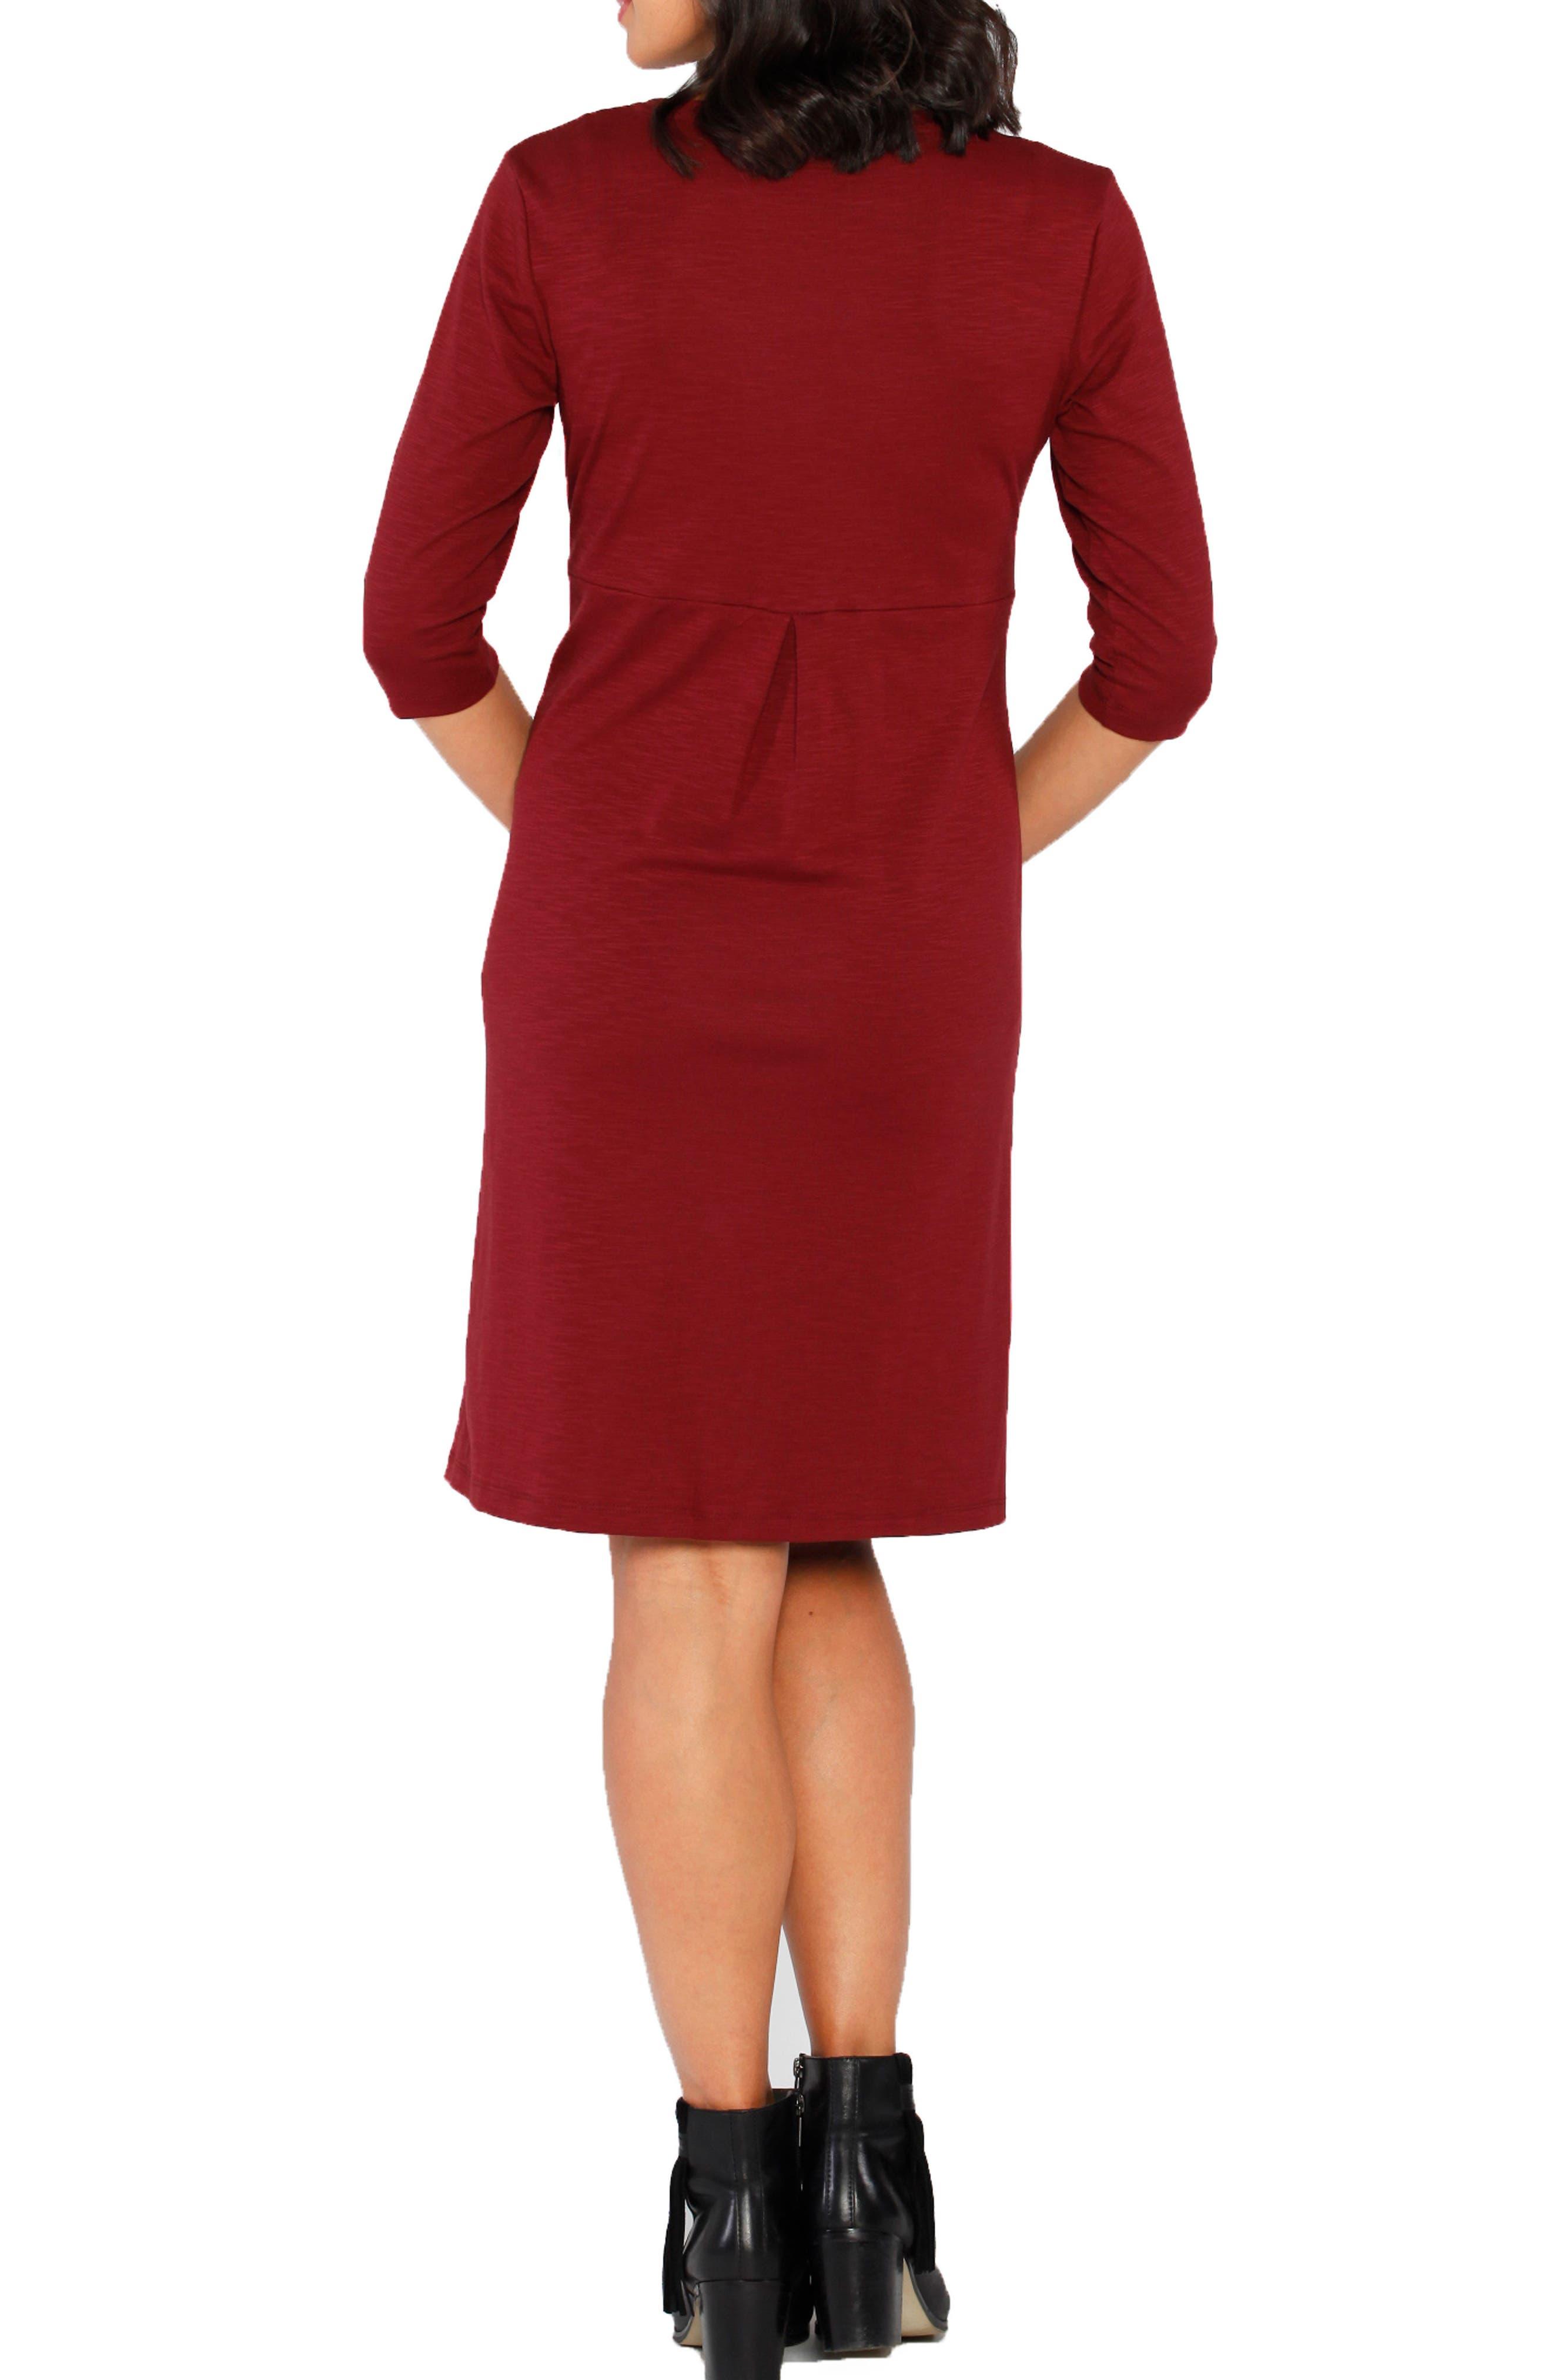 Stretch Jersey Maternity Dress,                             Alternate thumbnail 2, color,                             600